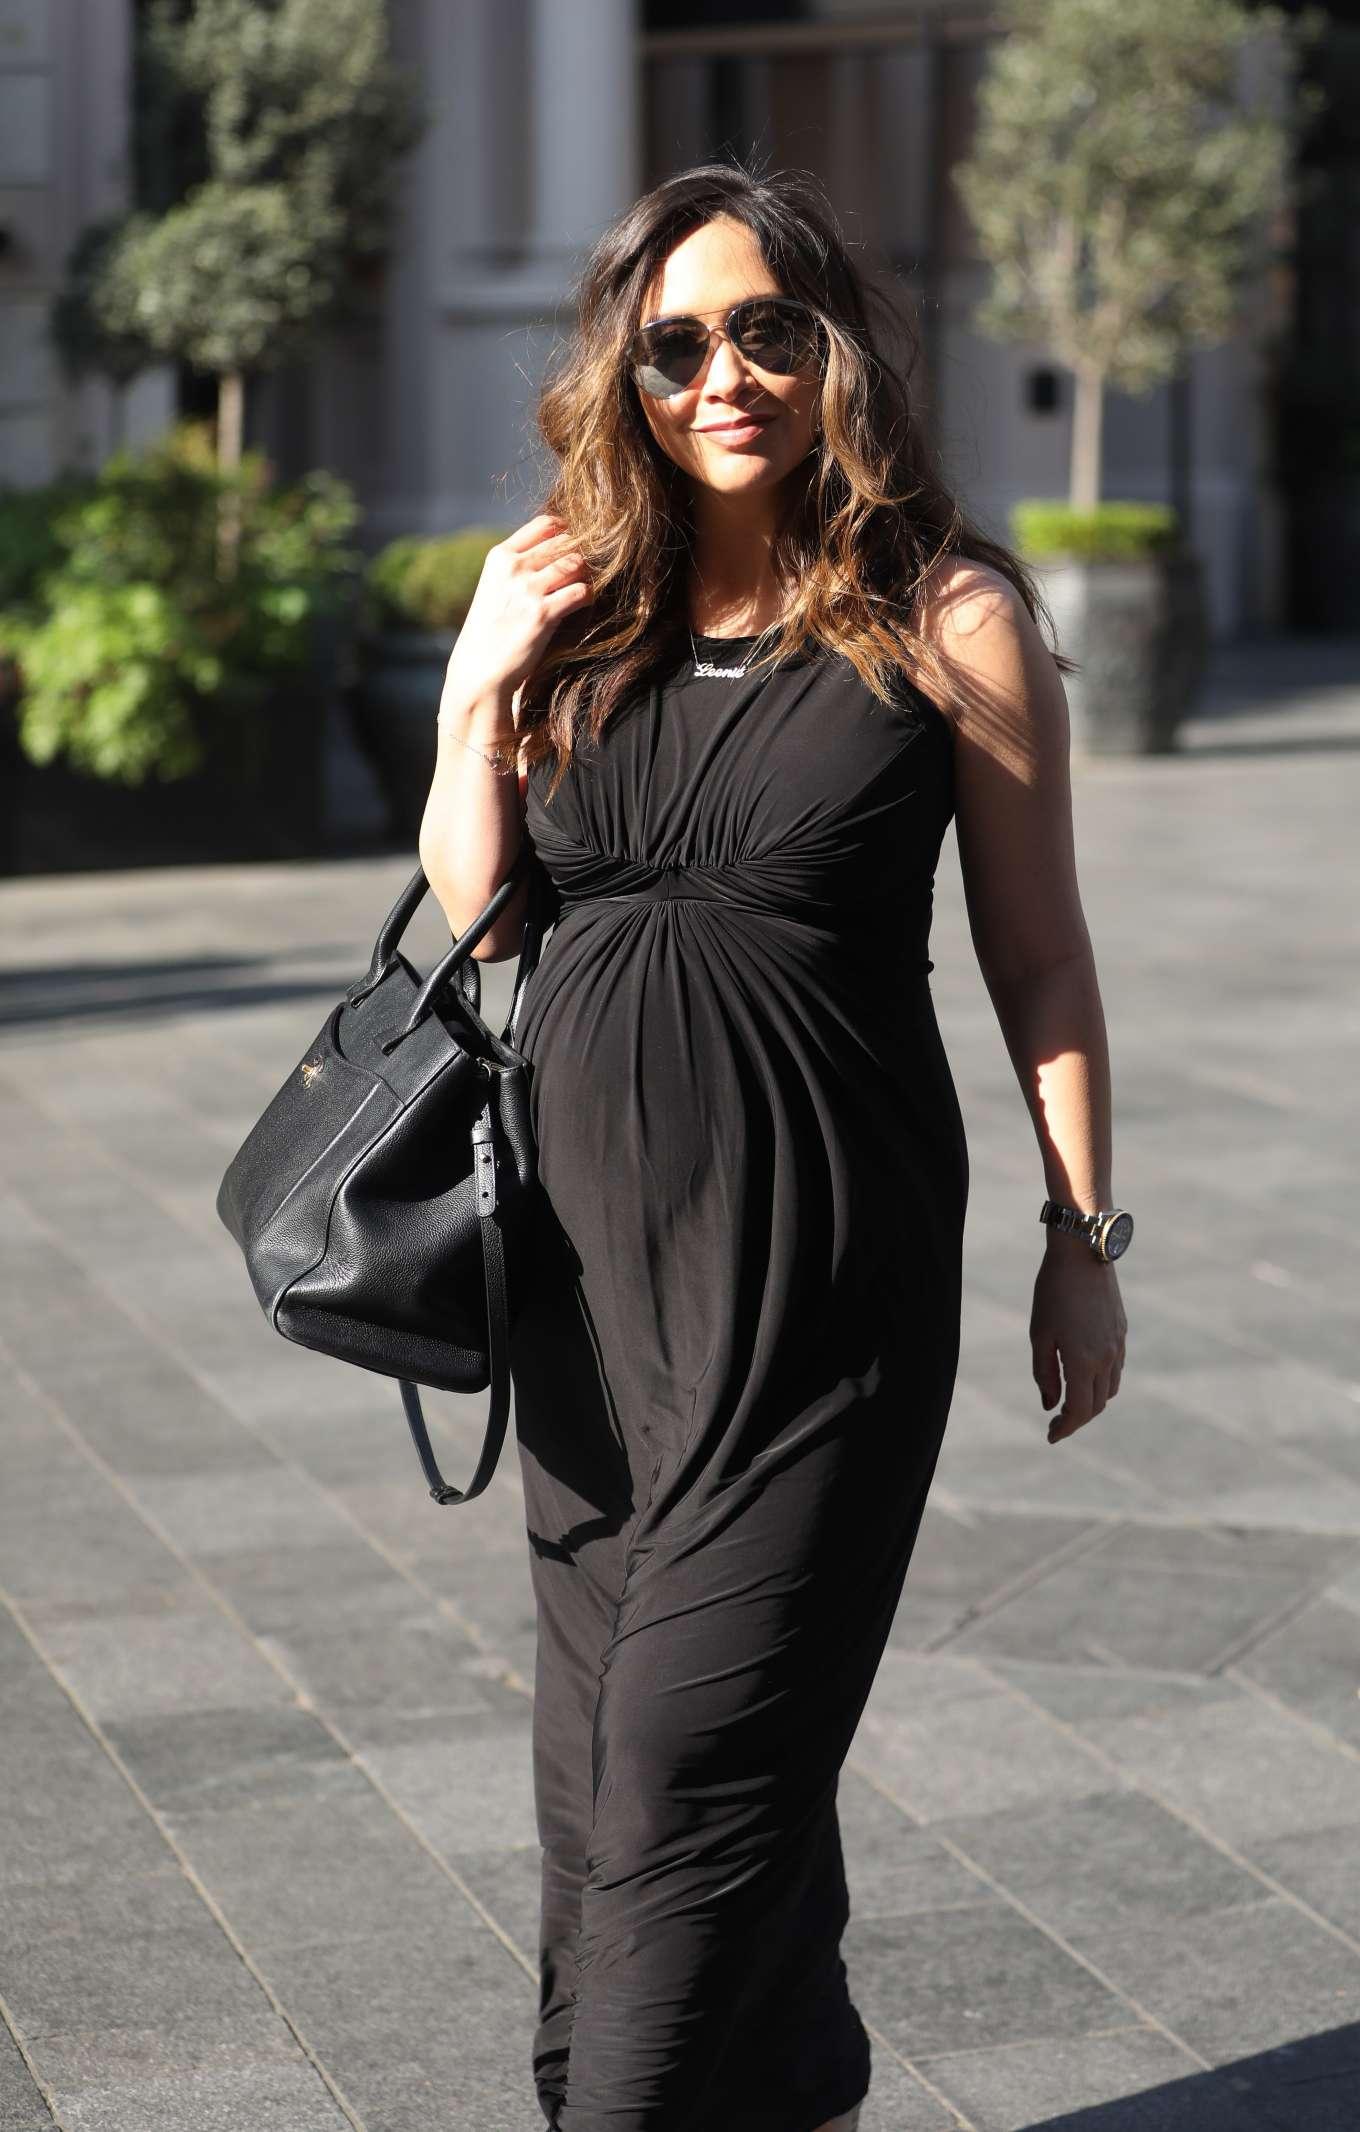 Myleene Klass 2019 : Myleene Klass: In classic black maternity dress arriving at Global Radio in London-07